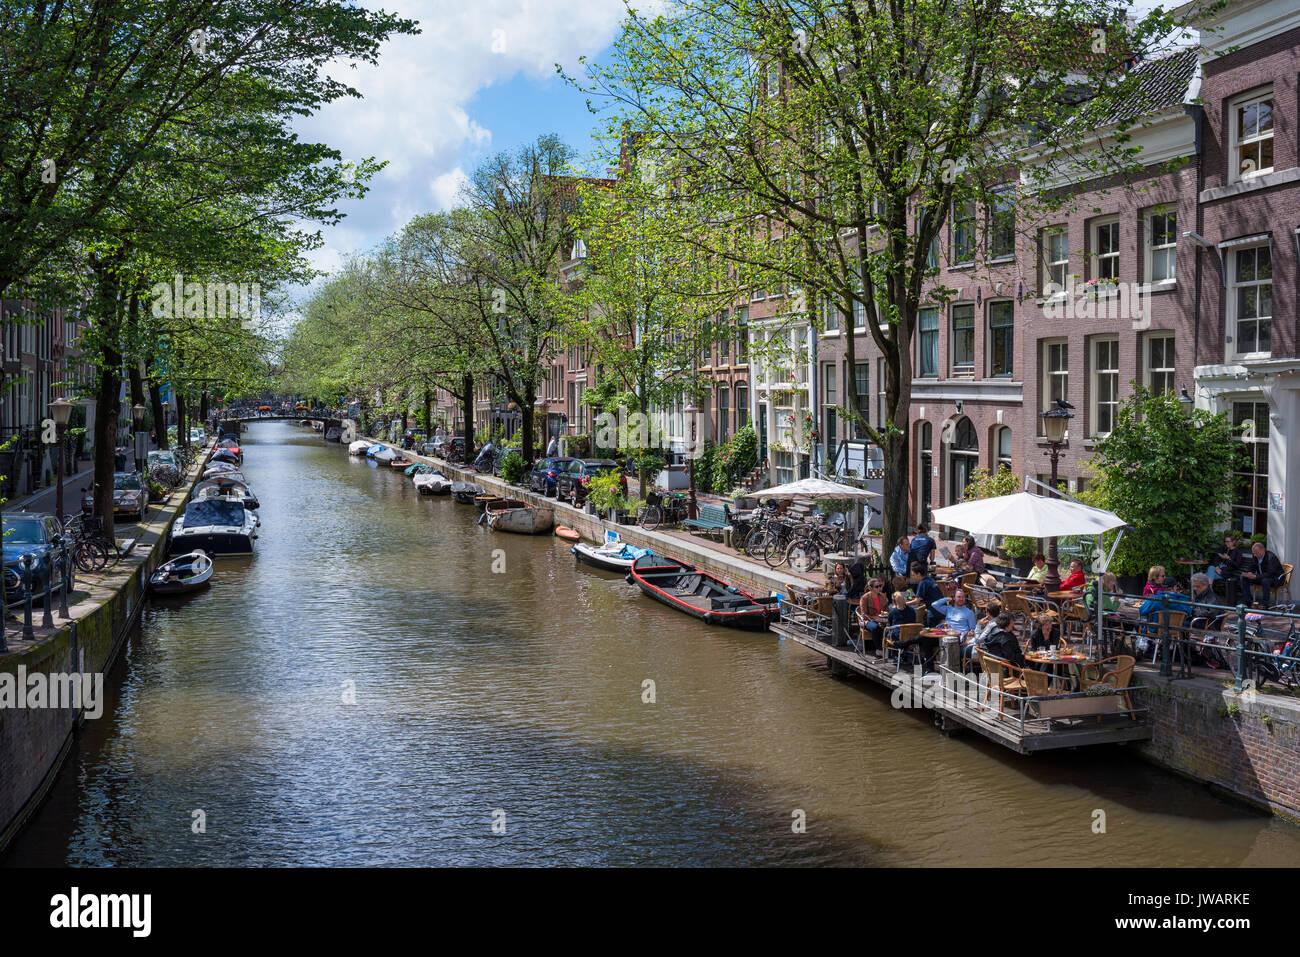 The Egelantiersgracht, Amsterdam, North Holland, Netherlands - Stock Image